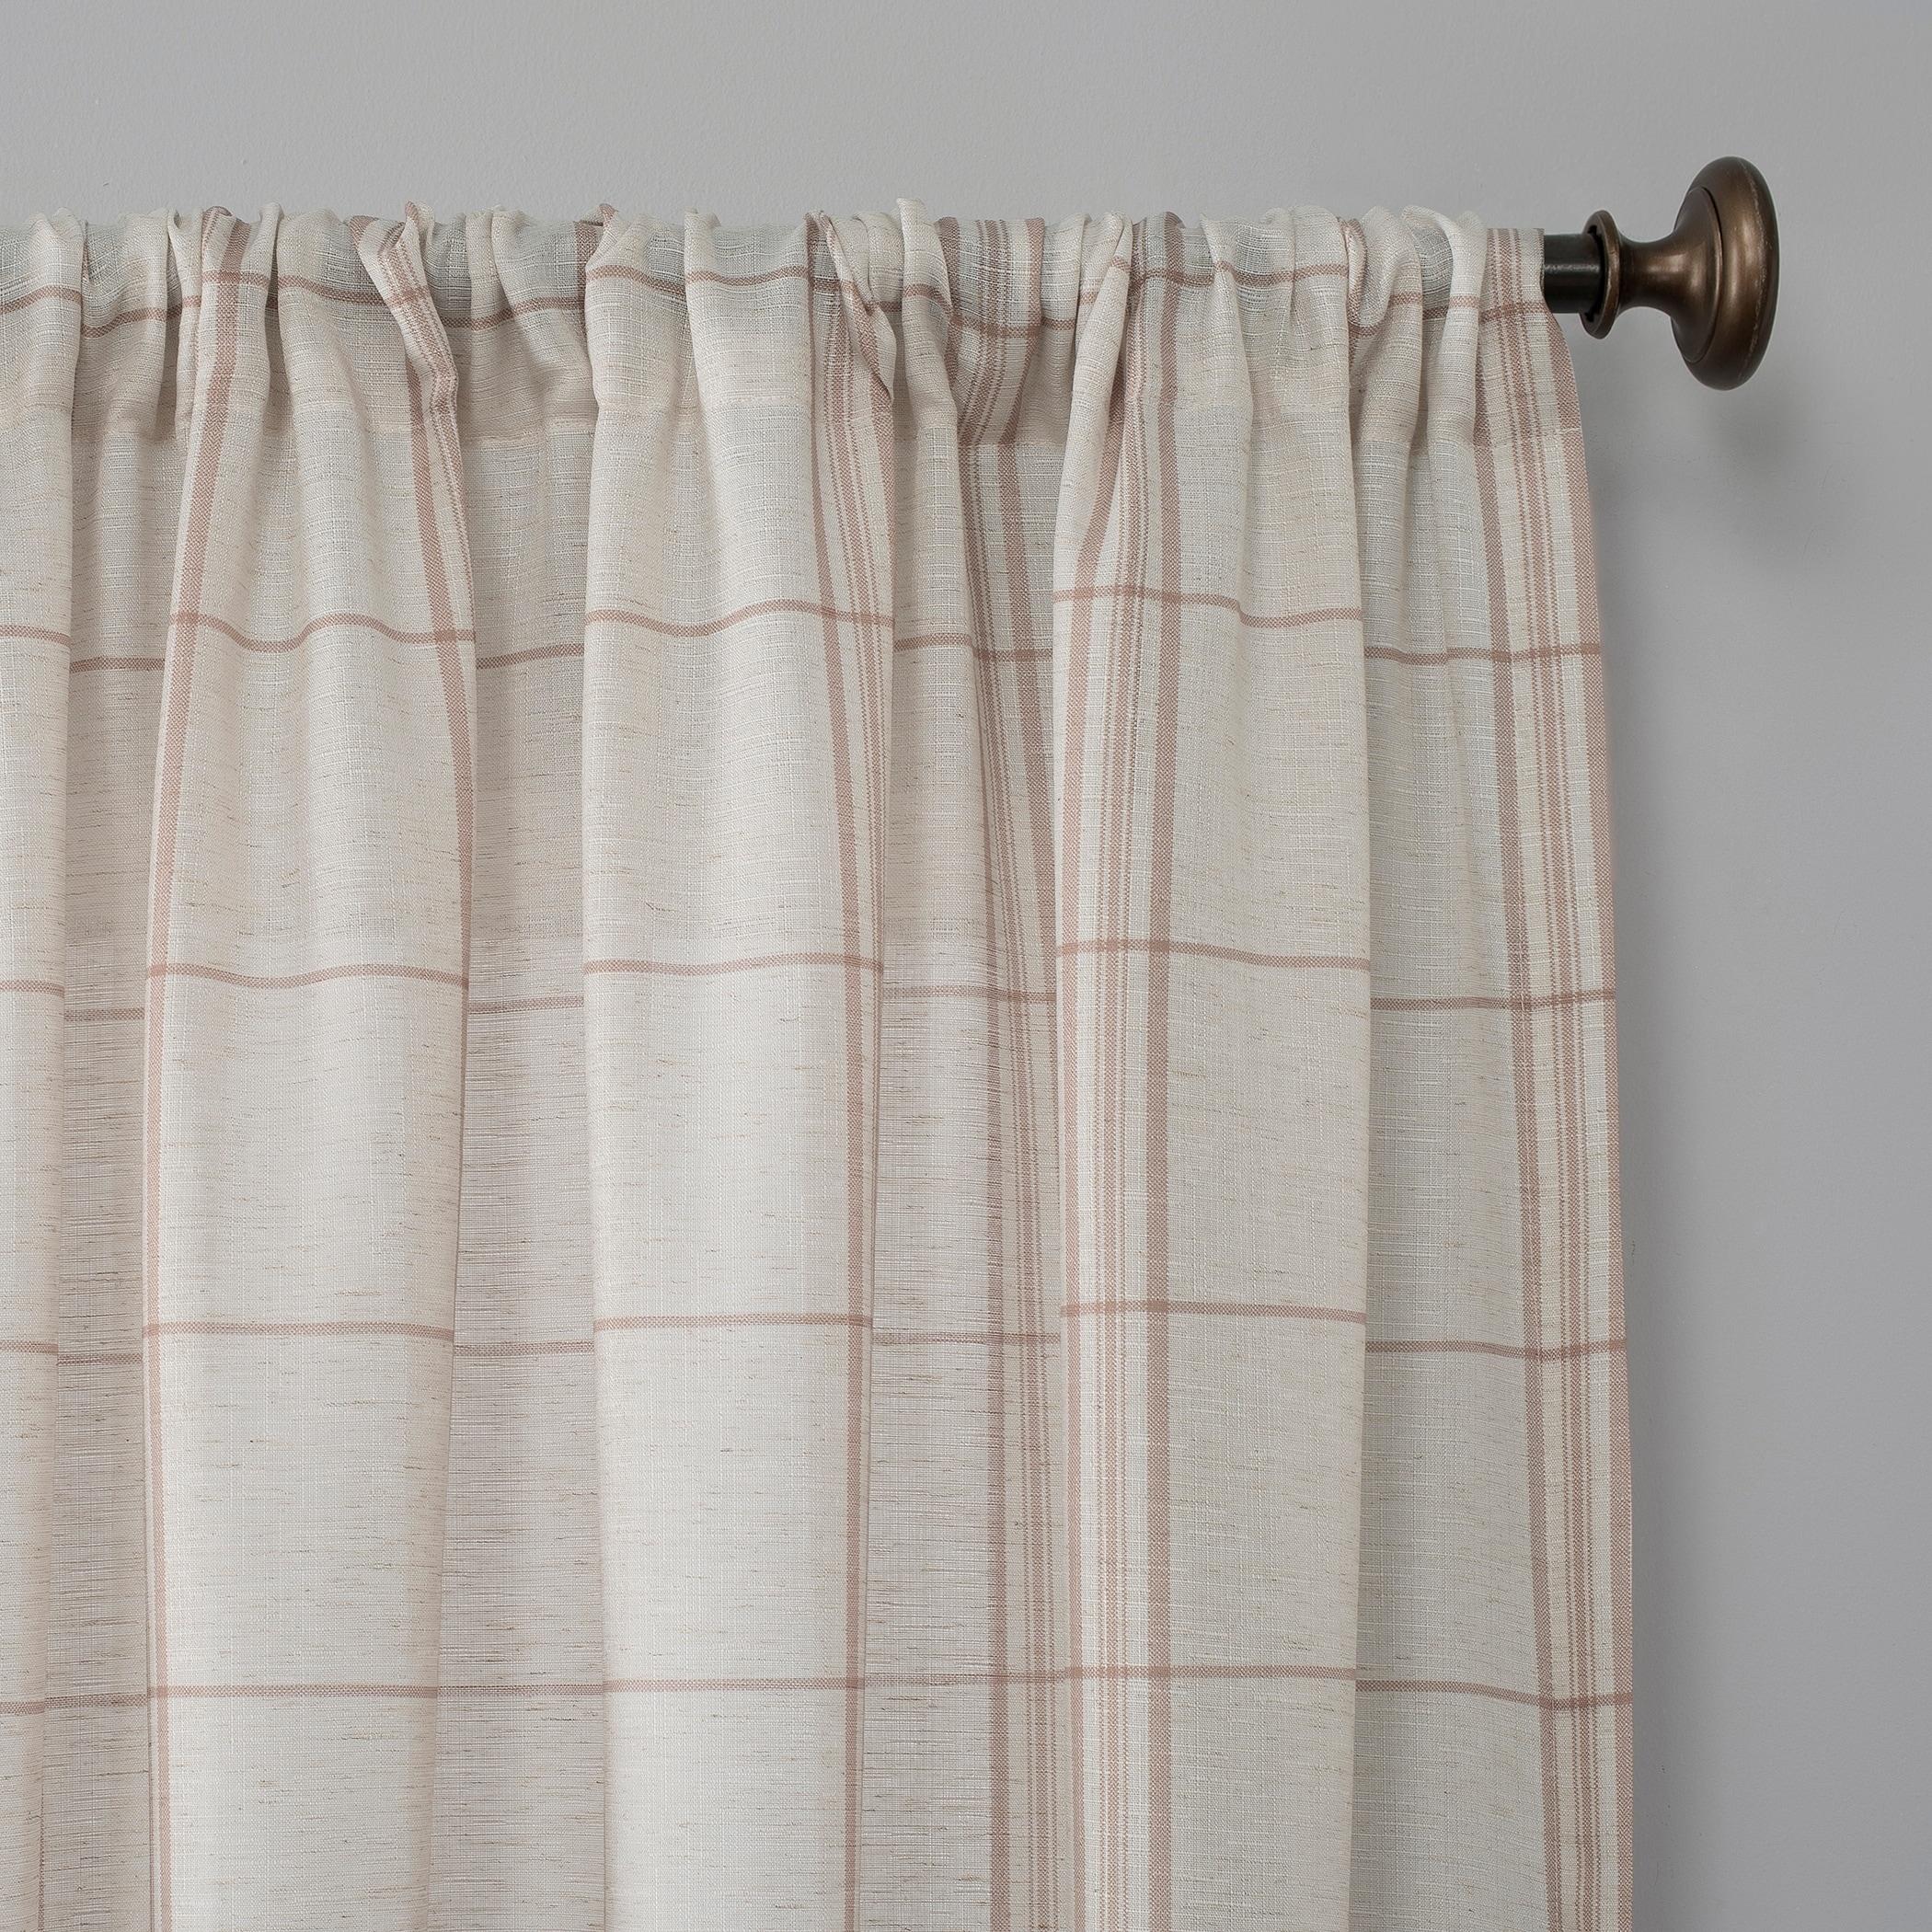 No 918 Castille Farmhouse Plaid Linen Semi Sheer Rod Pocket Curtain Panel On Sale Overstock 29826465